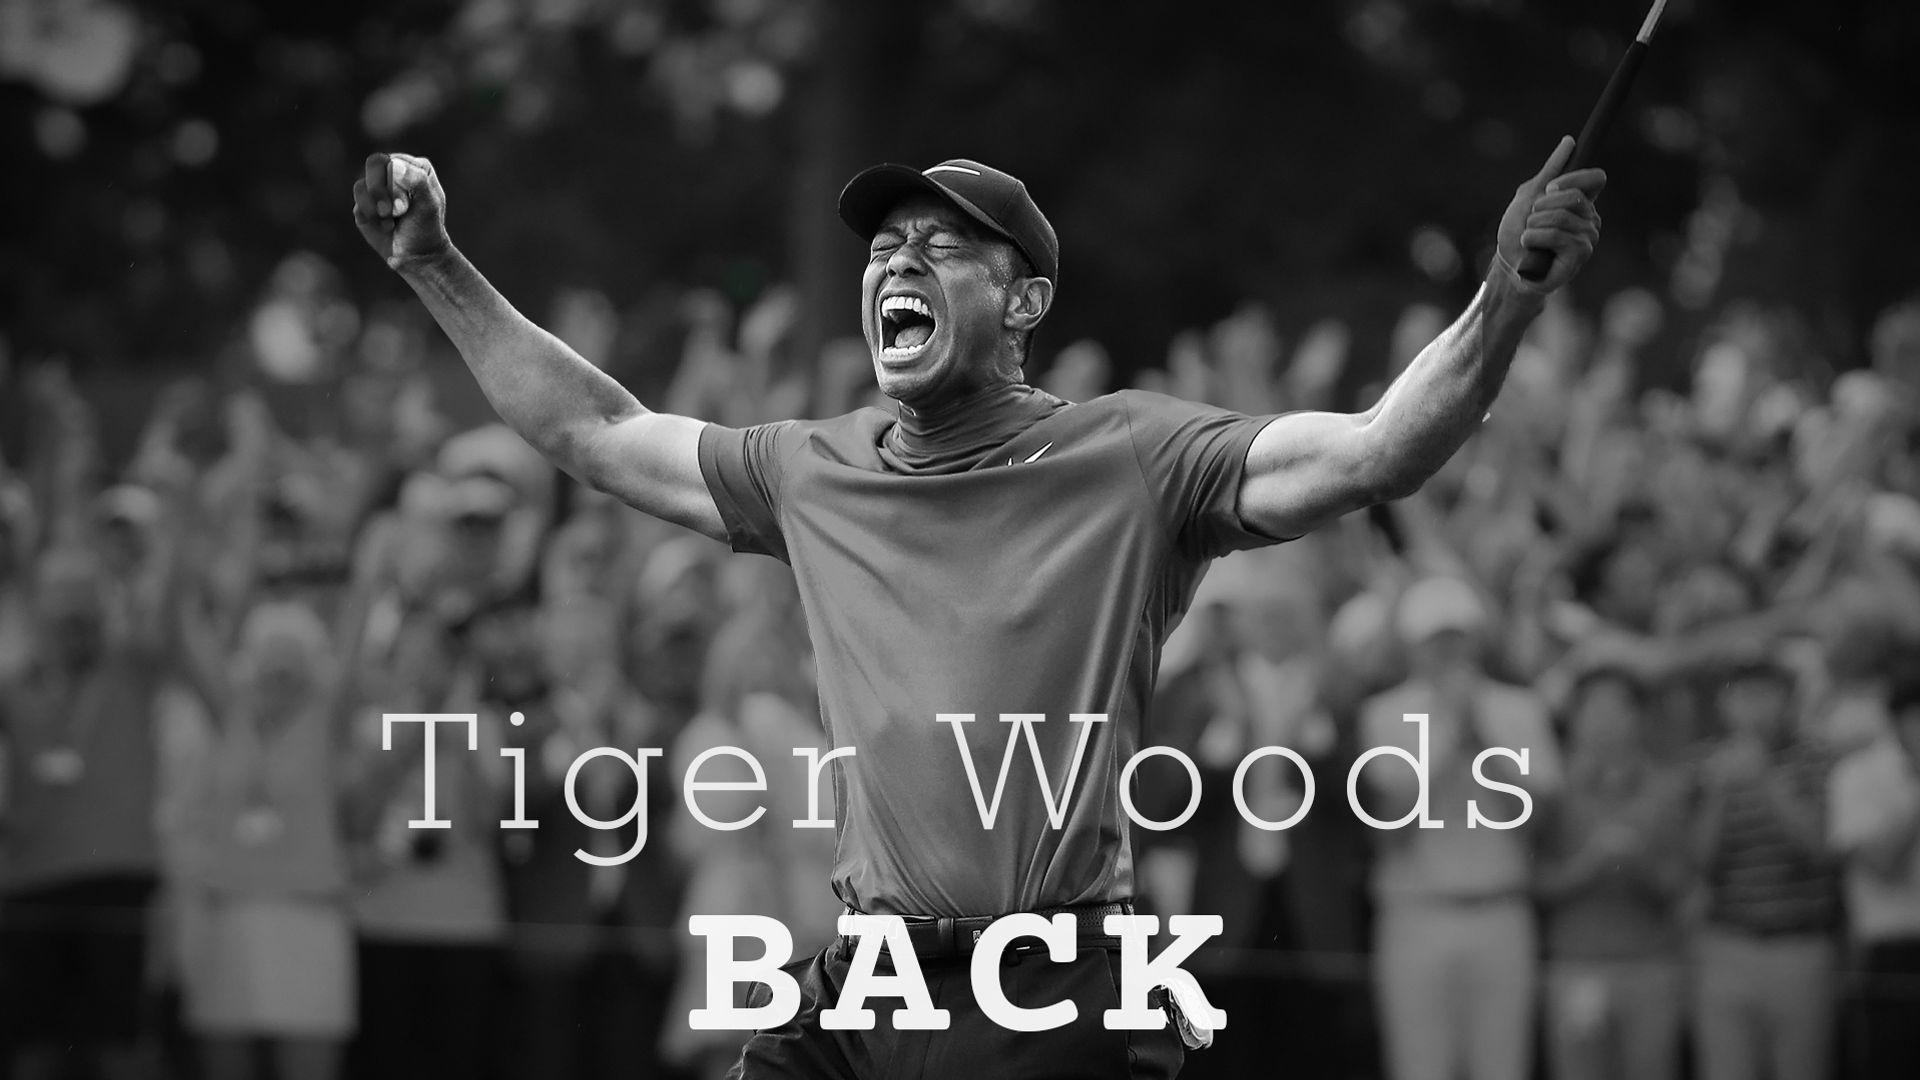 Tiger Woods documentary on Sky